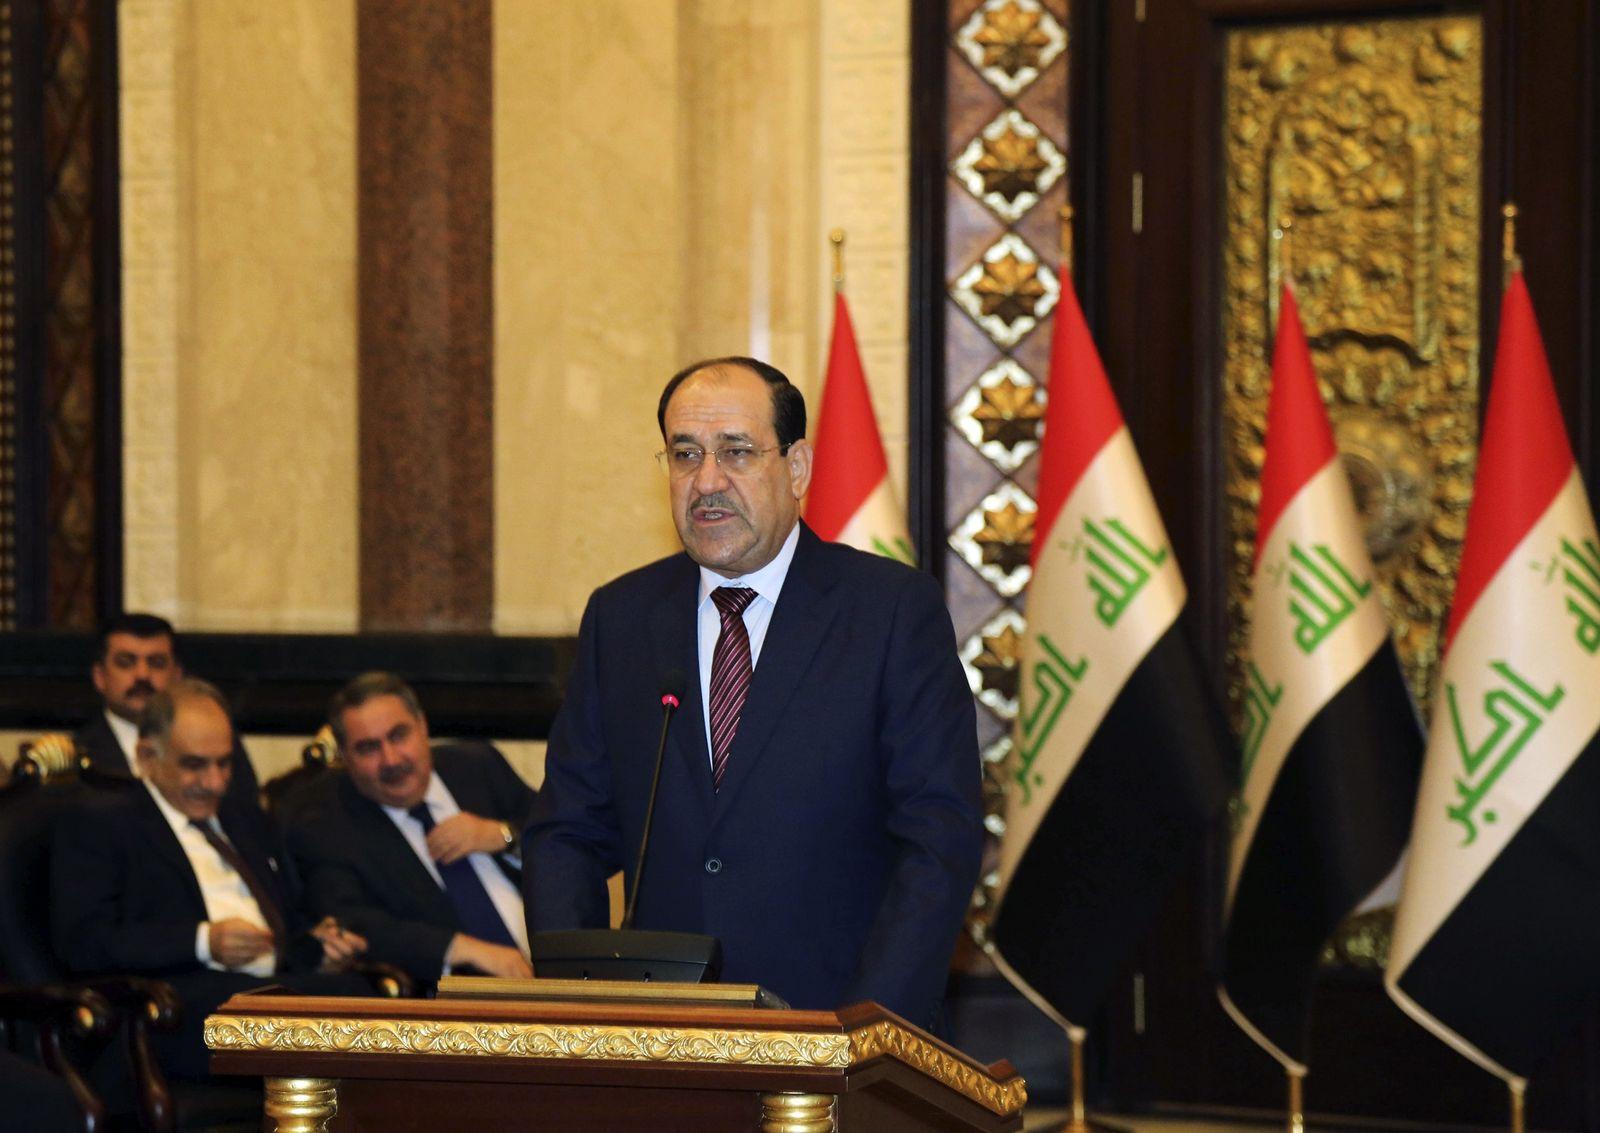 IRAQ Nouri al-Maliki